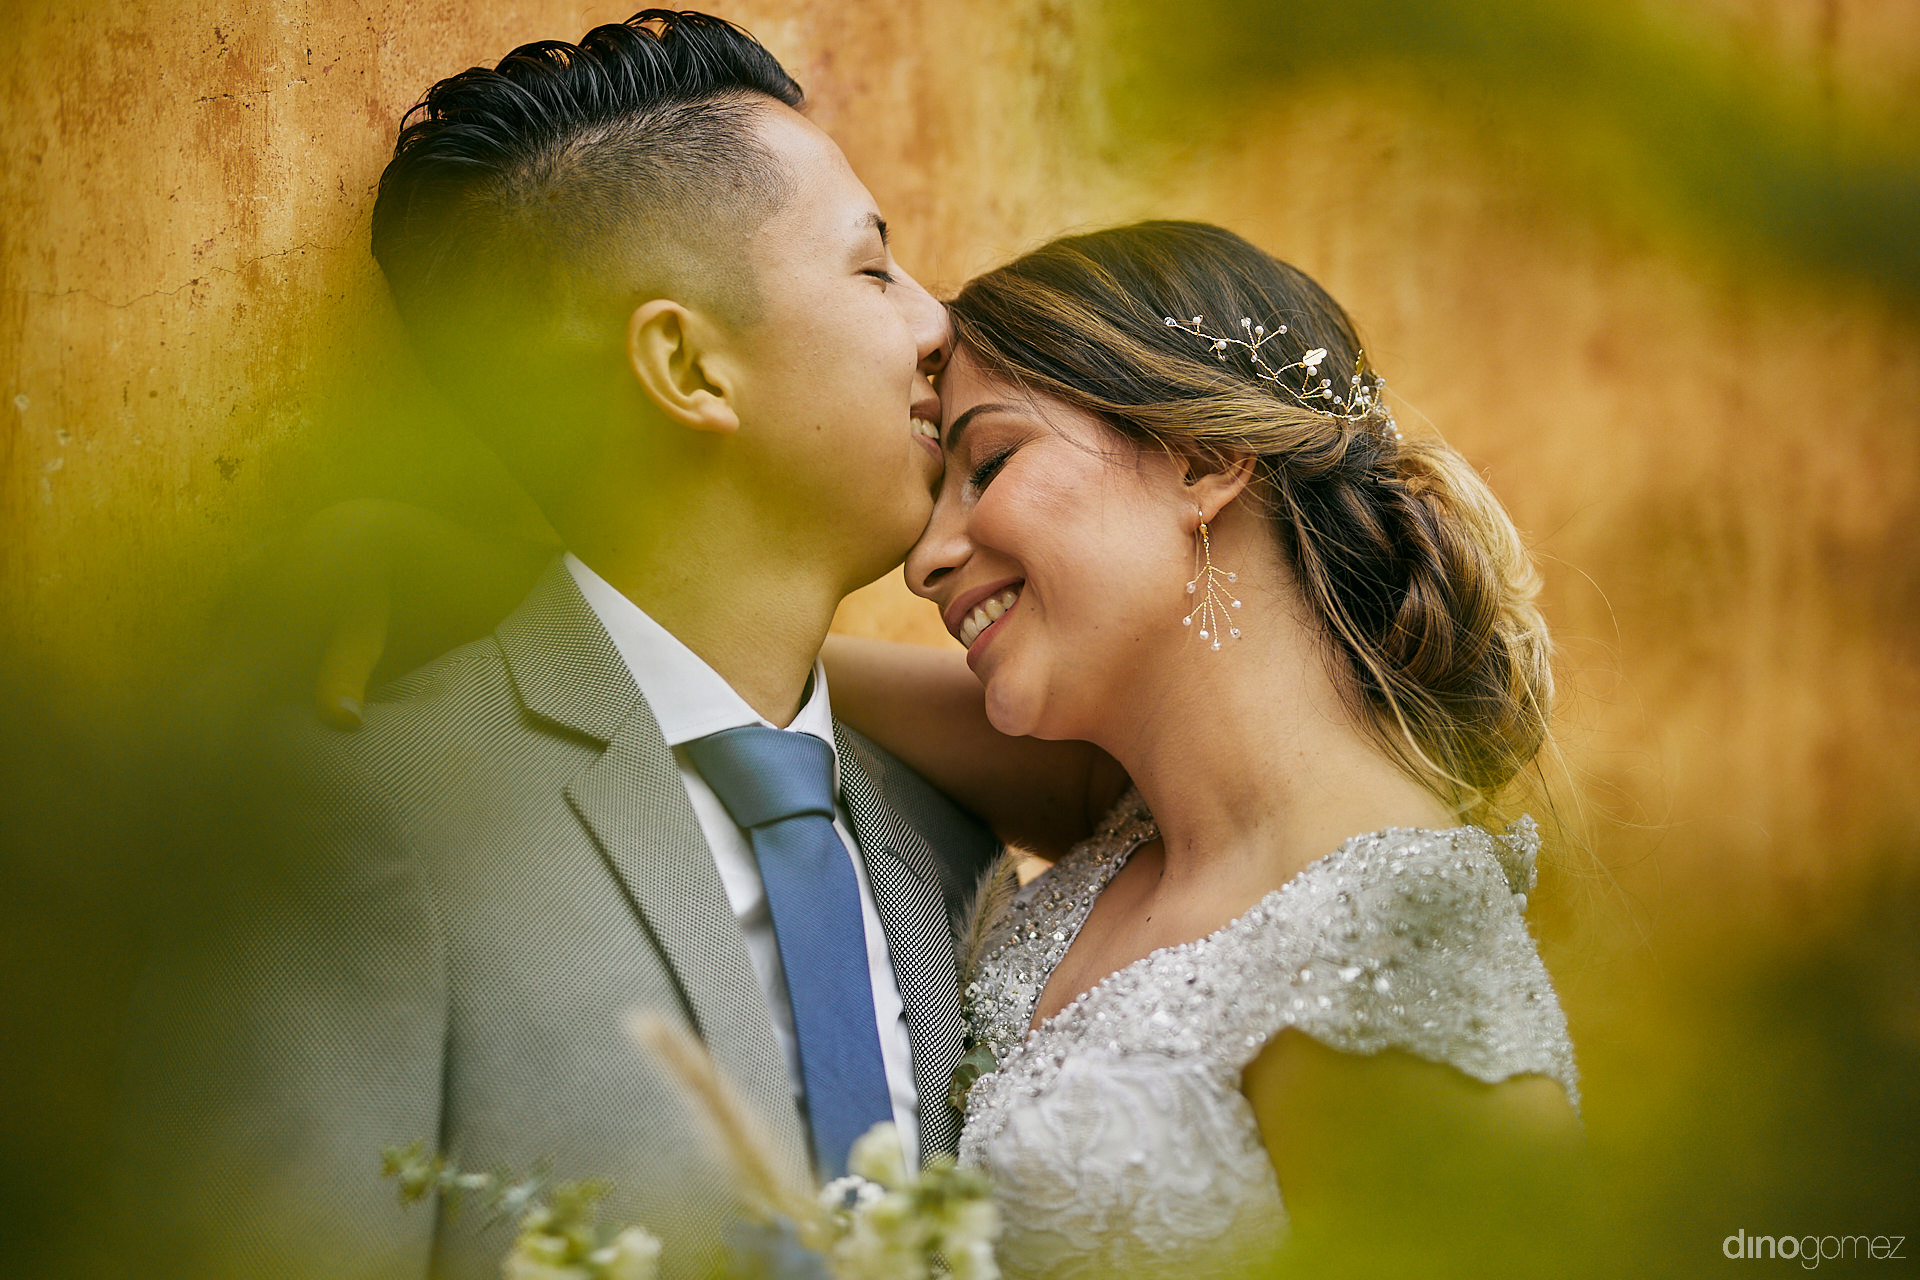 011 - Diy Budget Destination Weddings Can Be Prety Too!